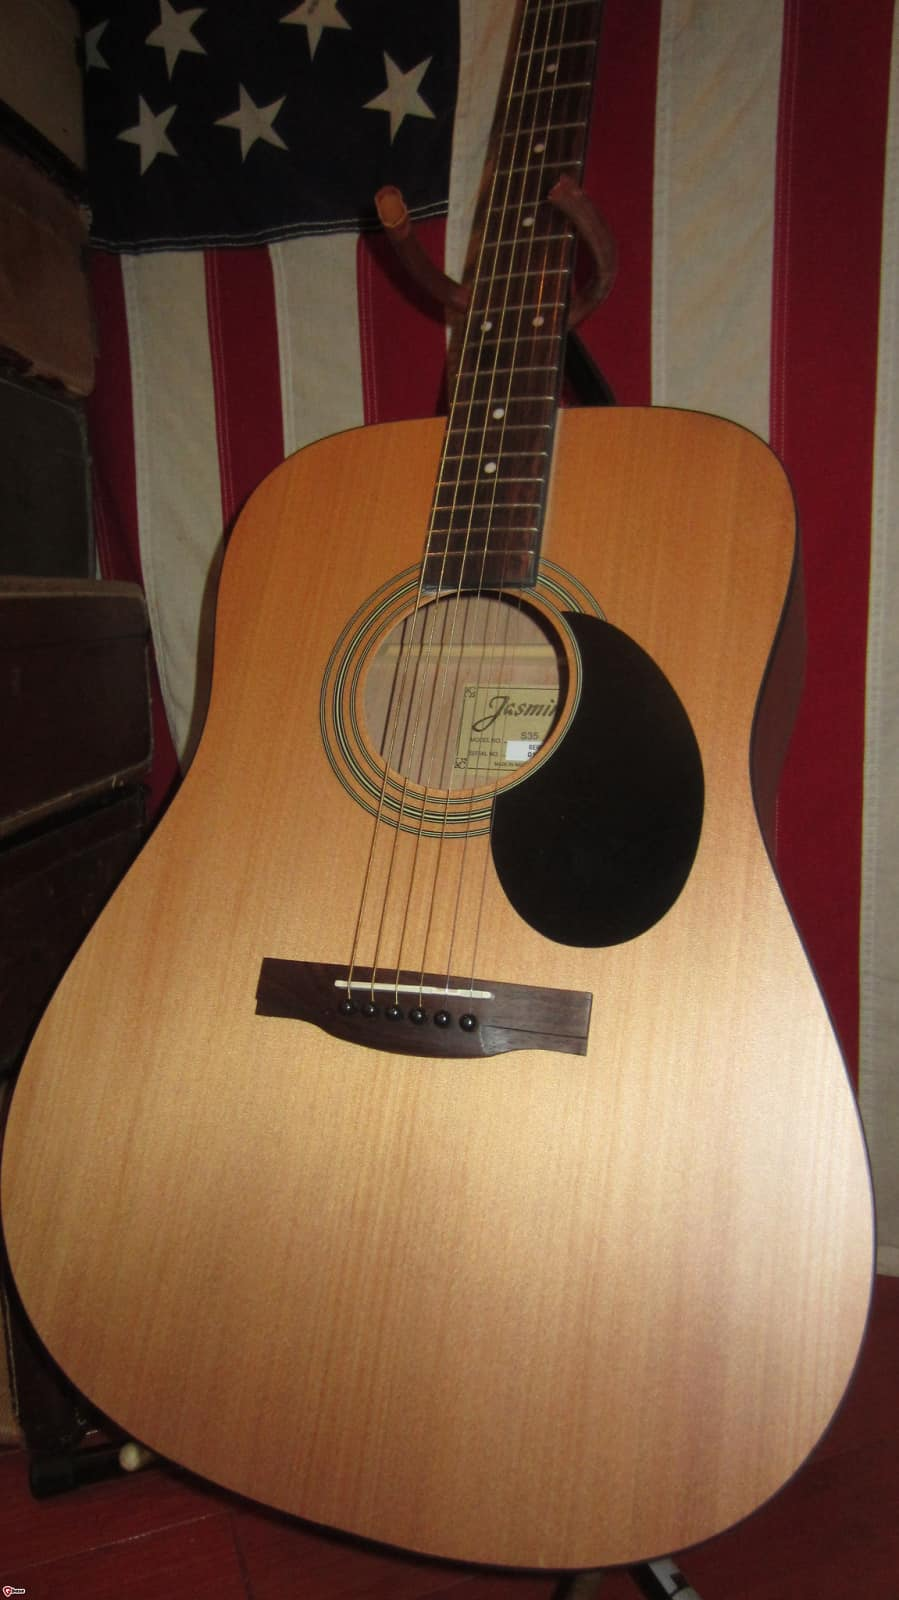 2016 jasmine s35 rivington guitars reverb. Black Bedroom Furniture Sets. Home Design Ideas